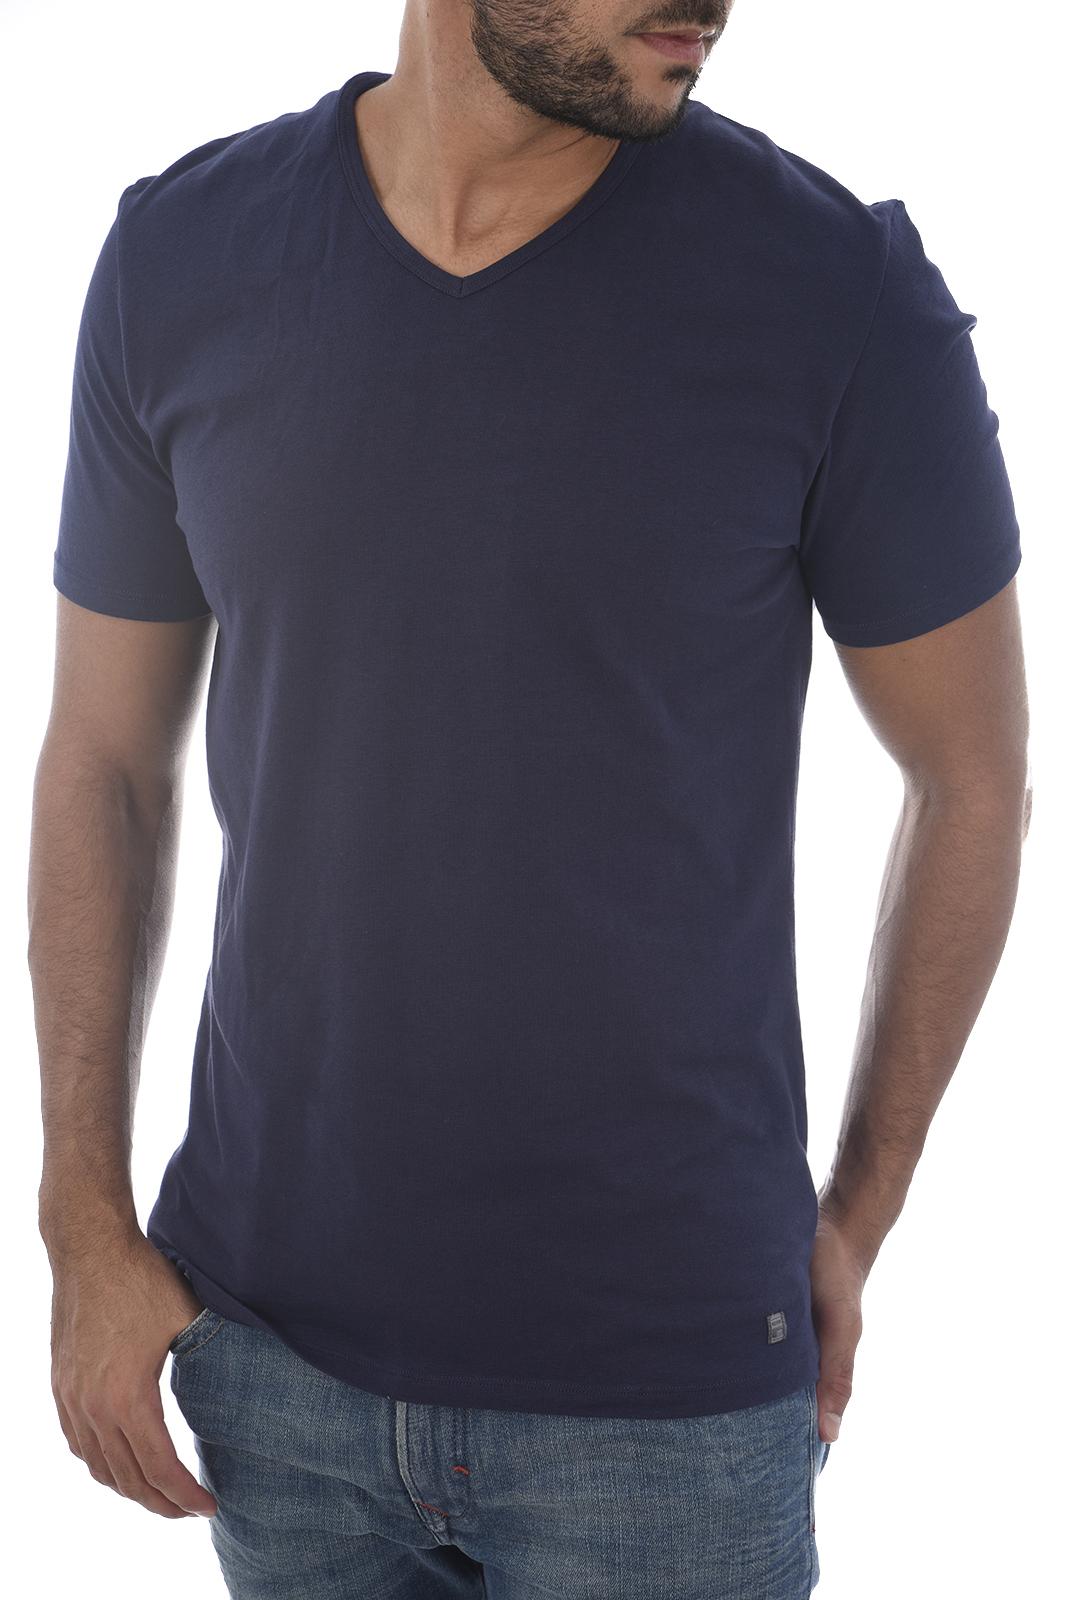 Tee-shirts  Fila 46240 007-BLU